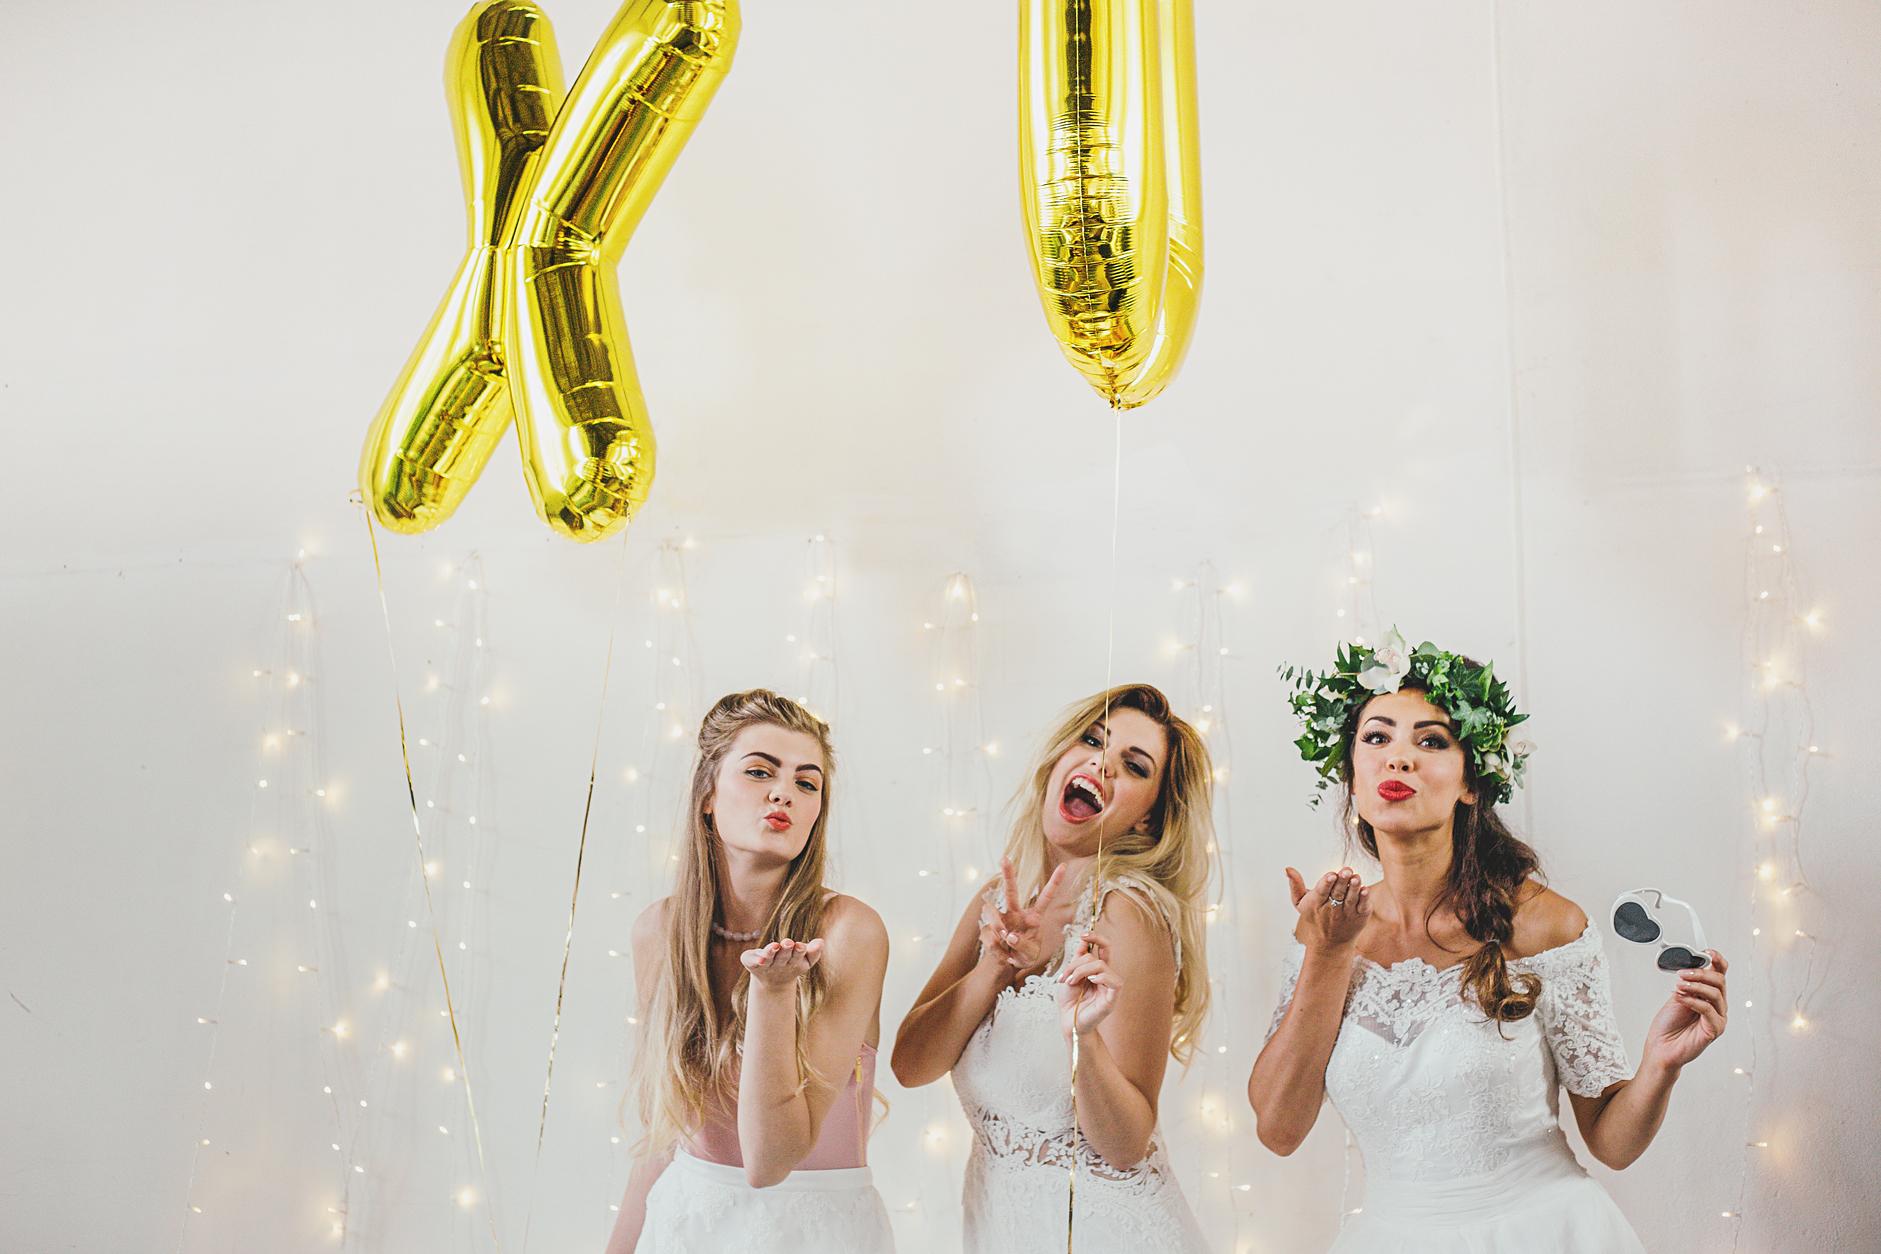 wedding_photographer_norfolk_norwich_kings_lynn (11).jpg